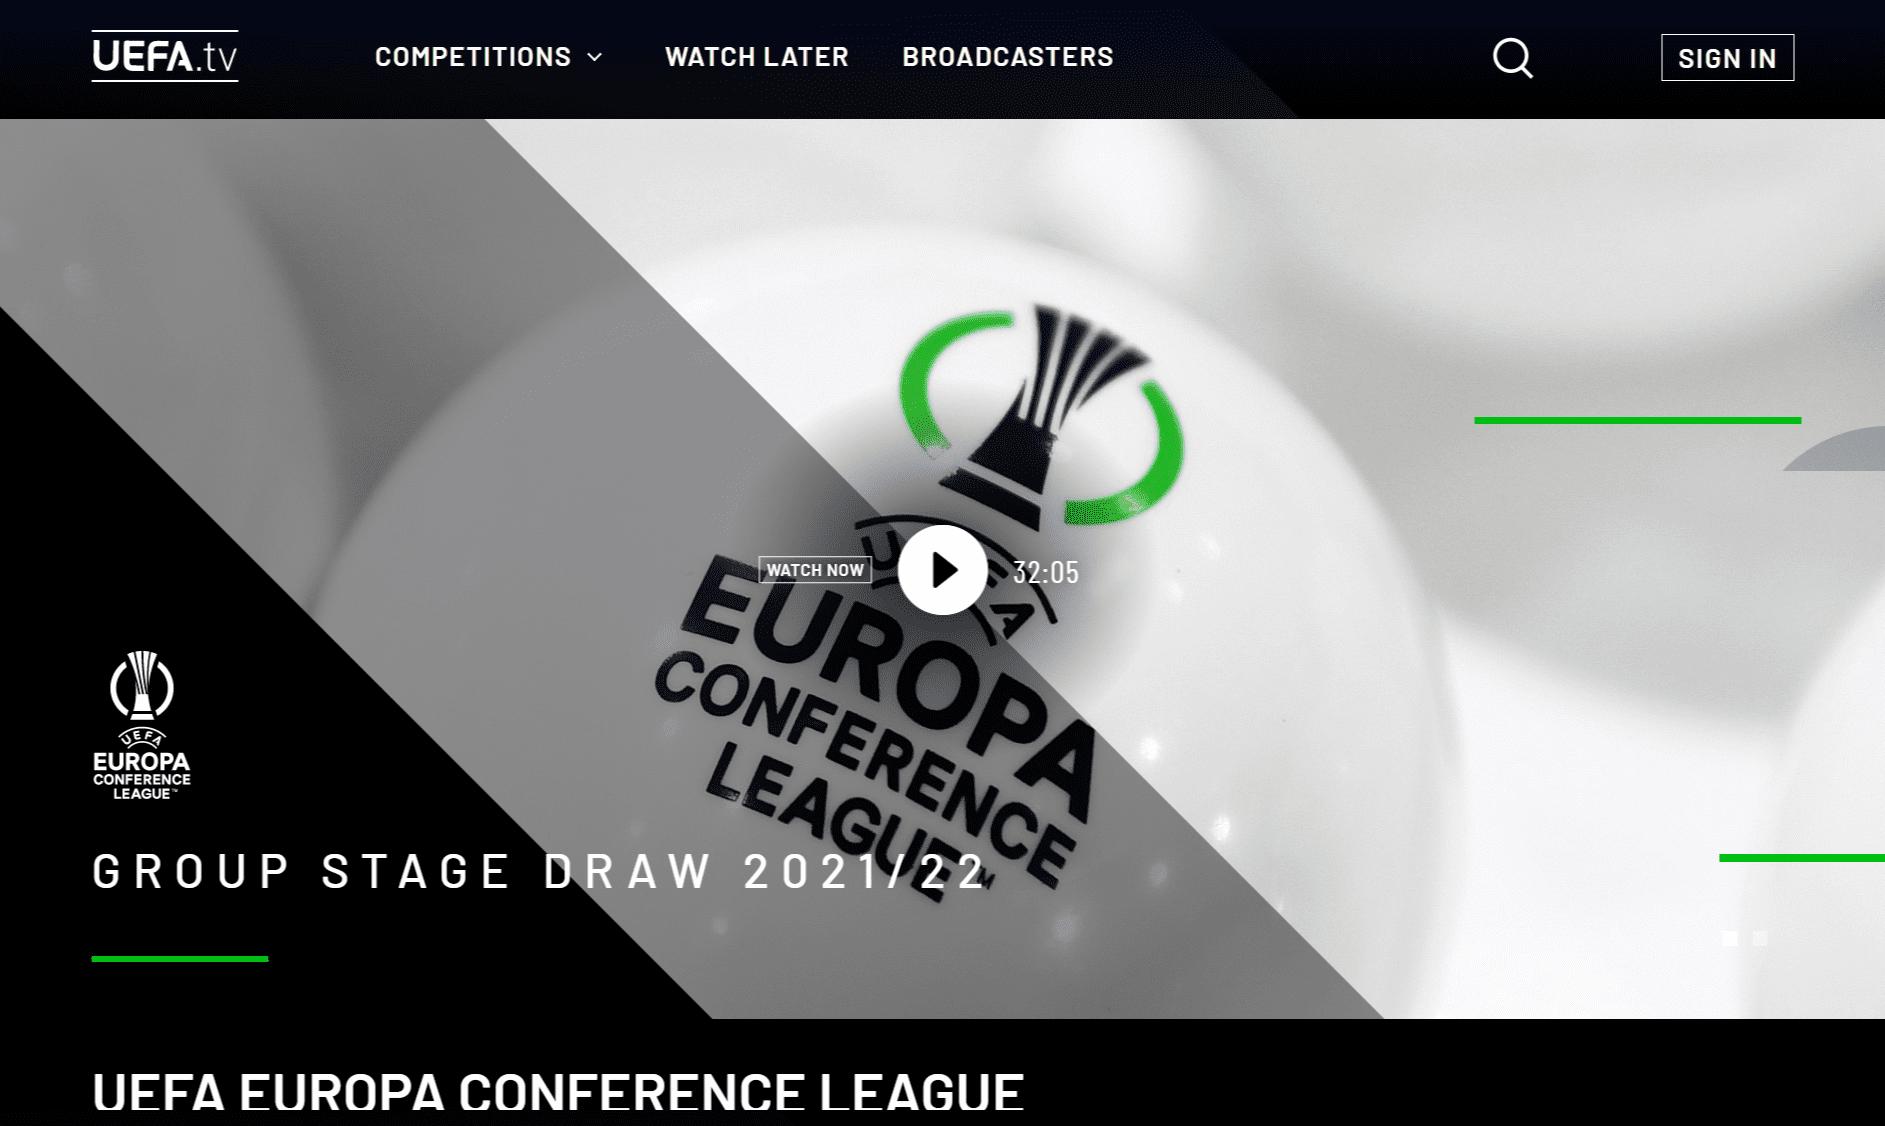 UEFA_Europa_Conference_League_UEFAtv